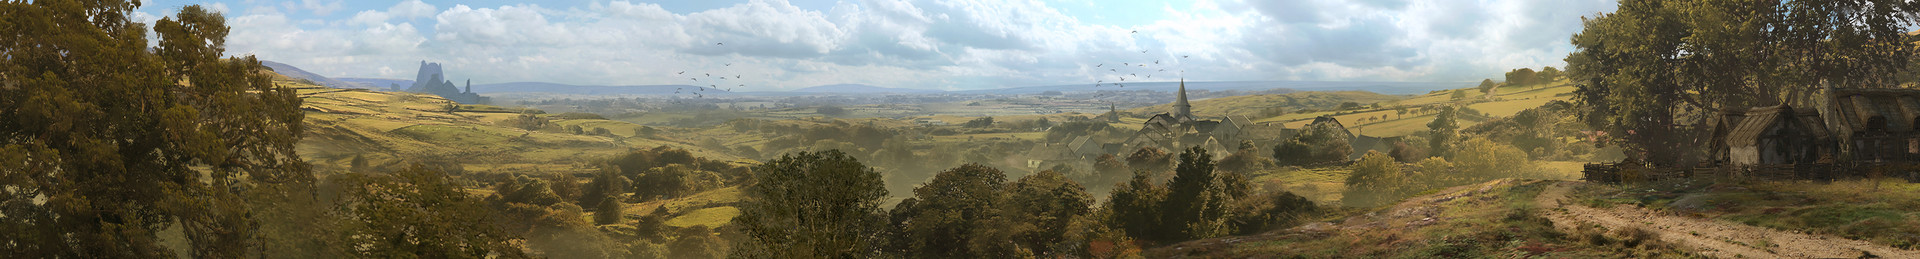 Guillem h pongiluppi 7 france panoramic 1